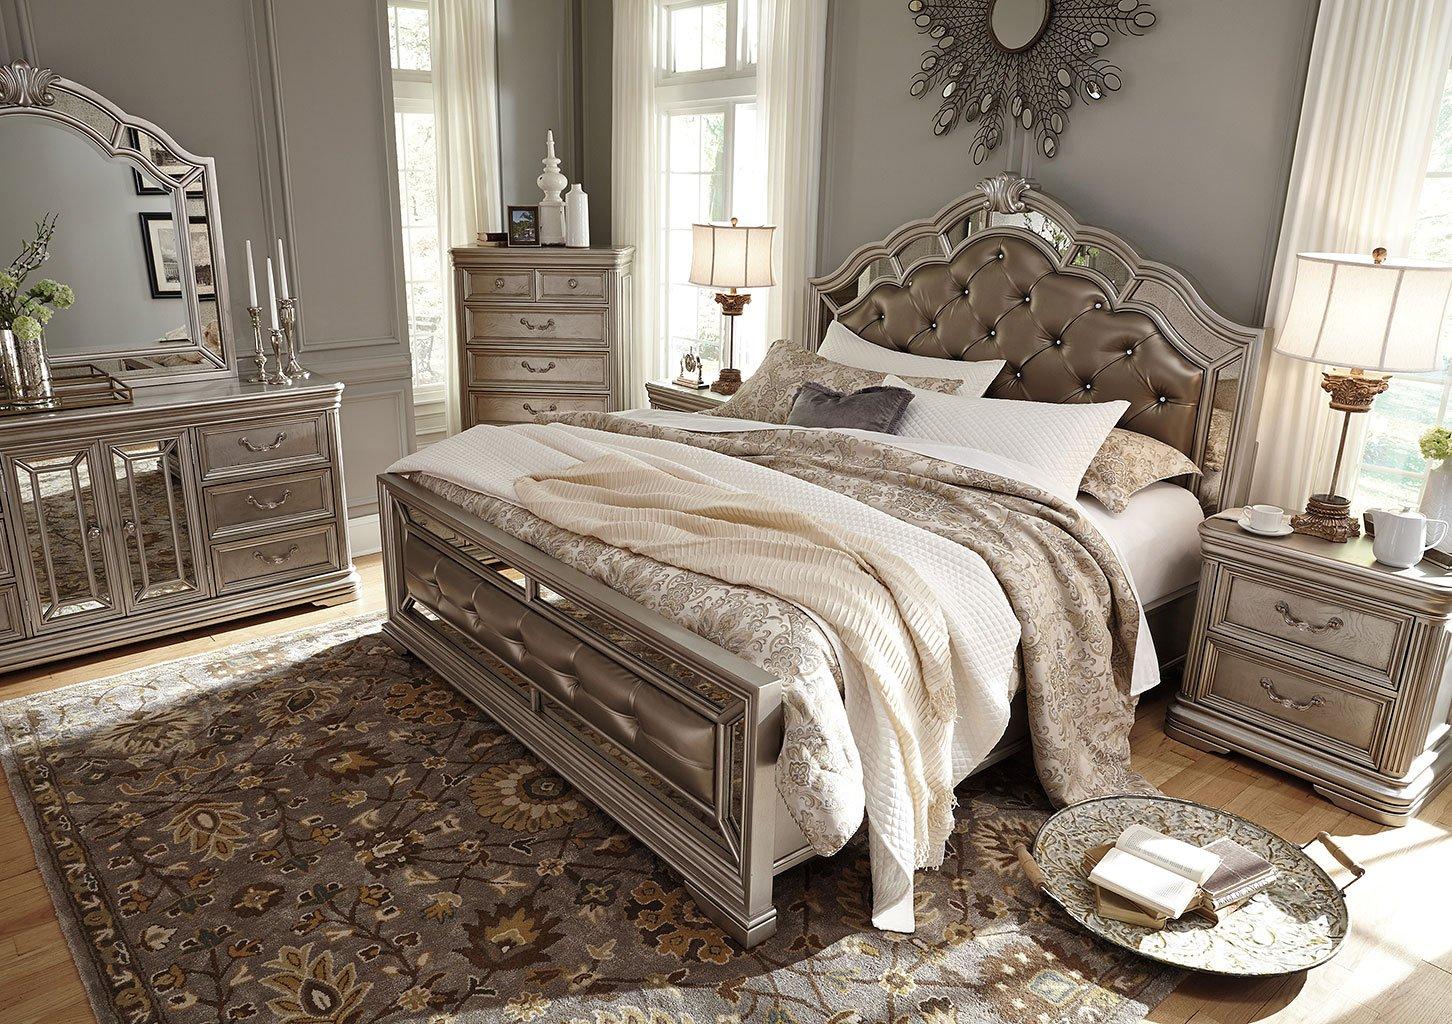 Birlanny Panel Bedroom Set Signature Design, 3 Reviews